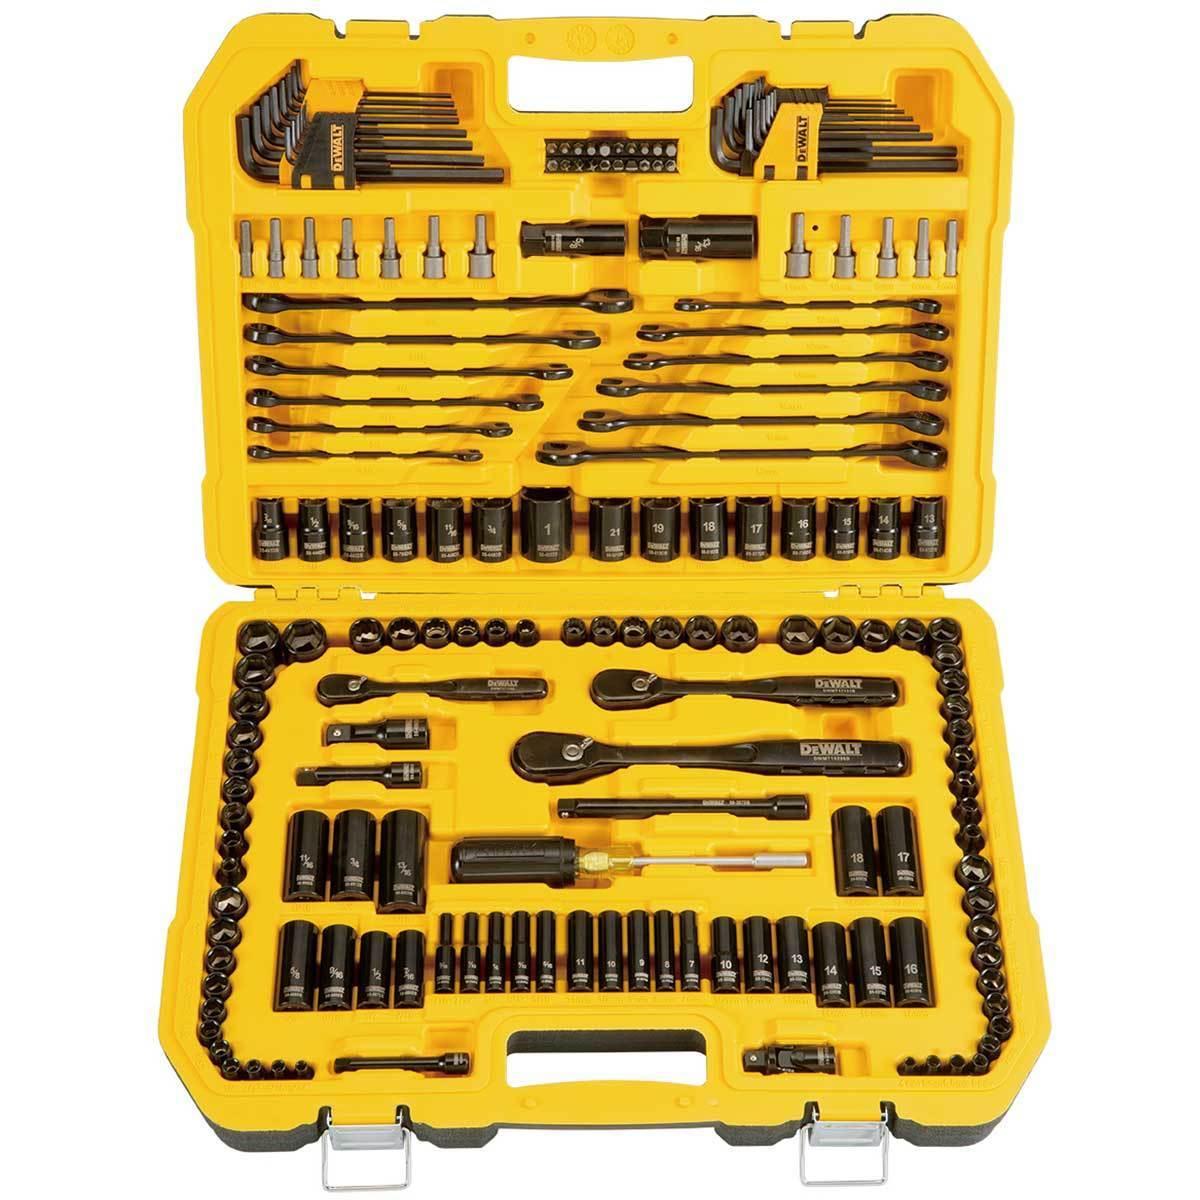 DEWALT® 181 Piece Mechanics Tool Set £99.99 Including Delivery @ Costco